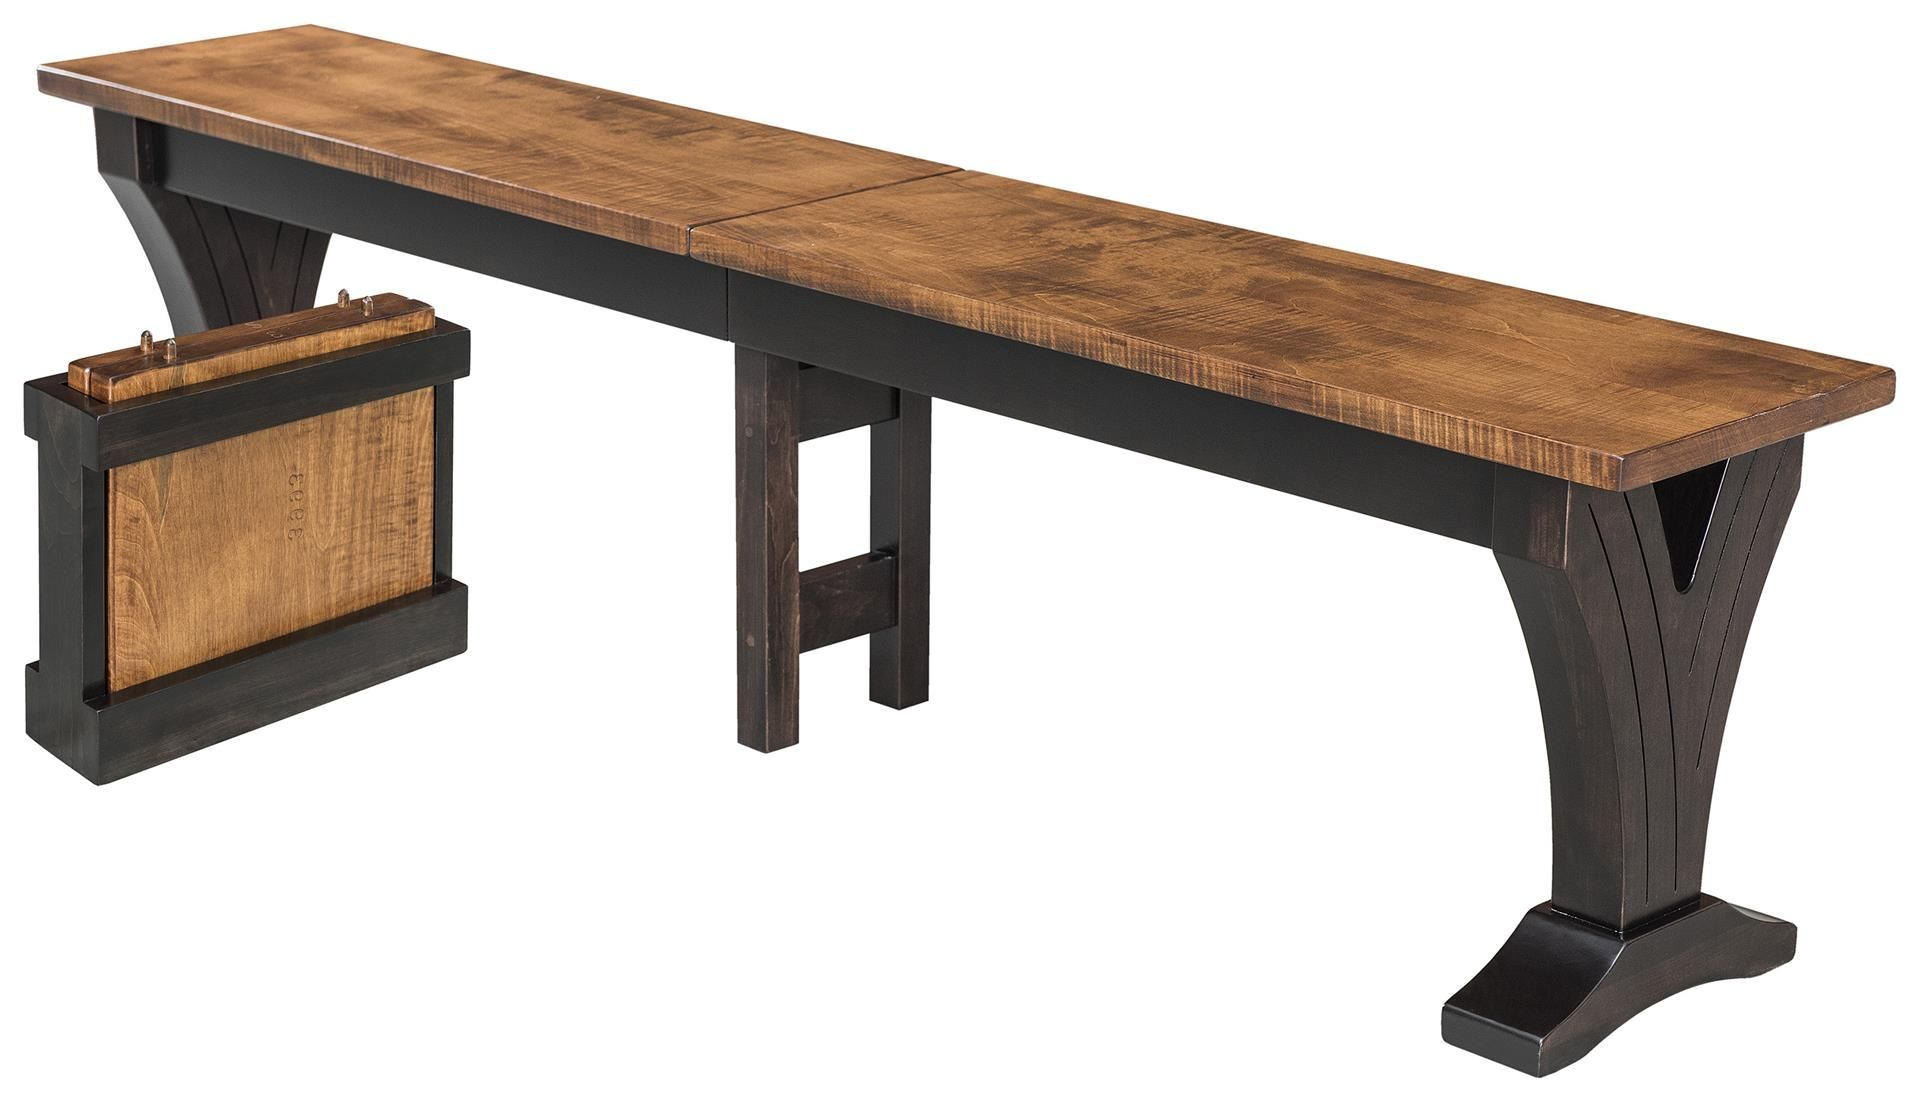 Amish Amelia Bench Amish Furniture Furniture Dining Furniture